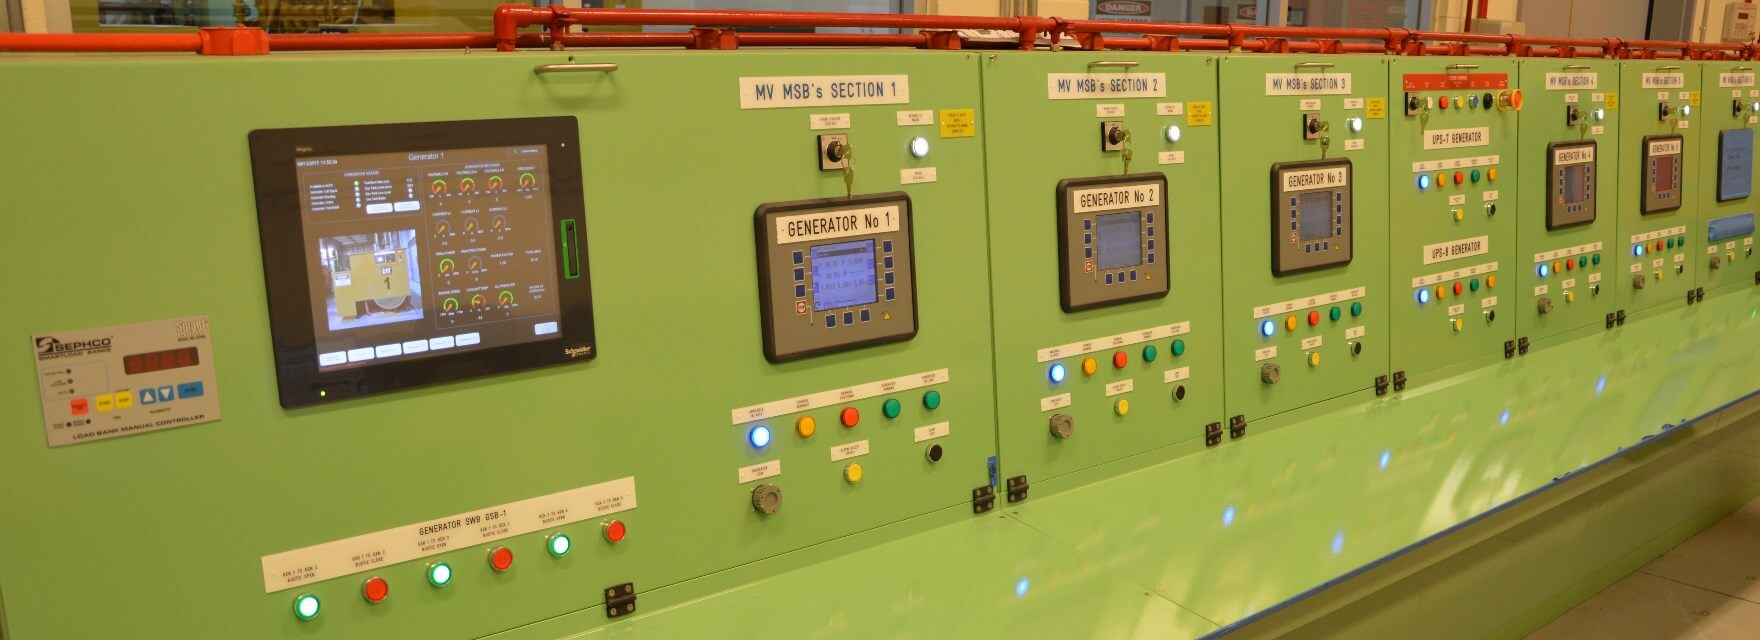 generator control system